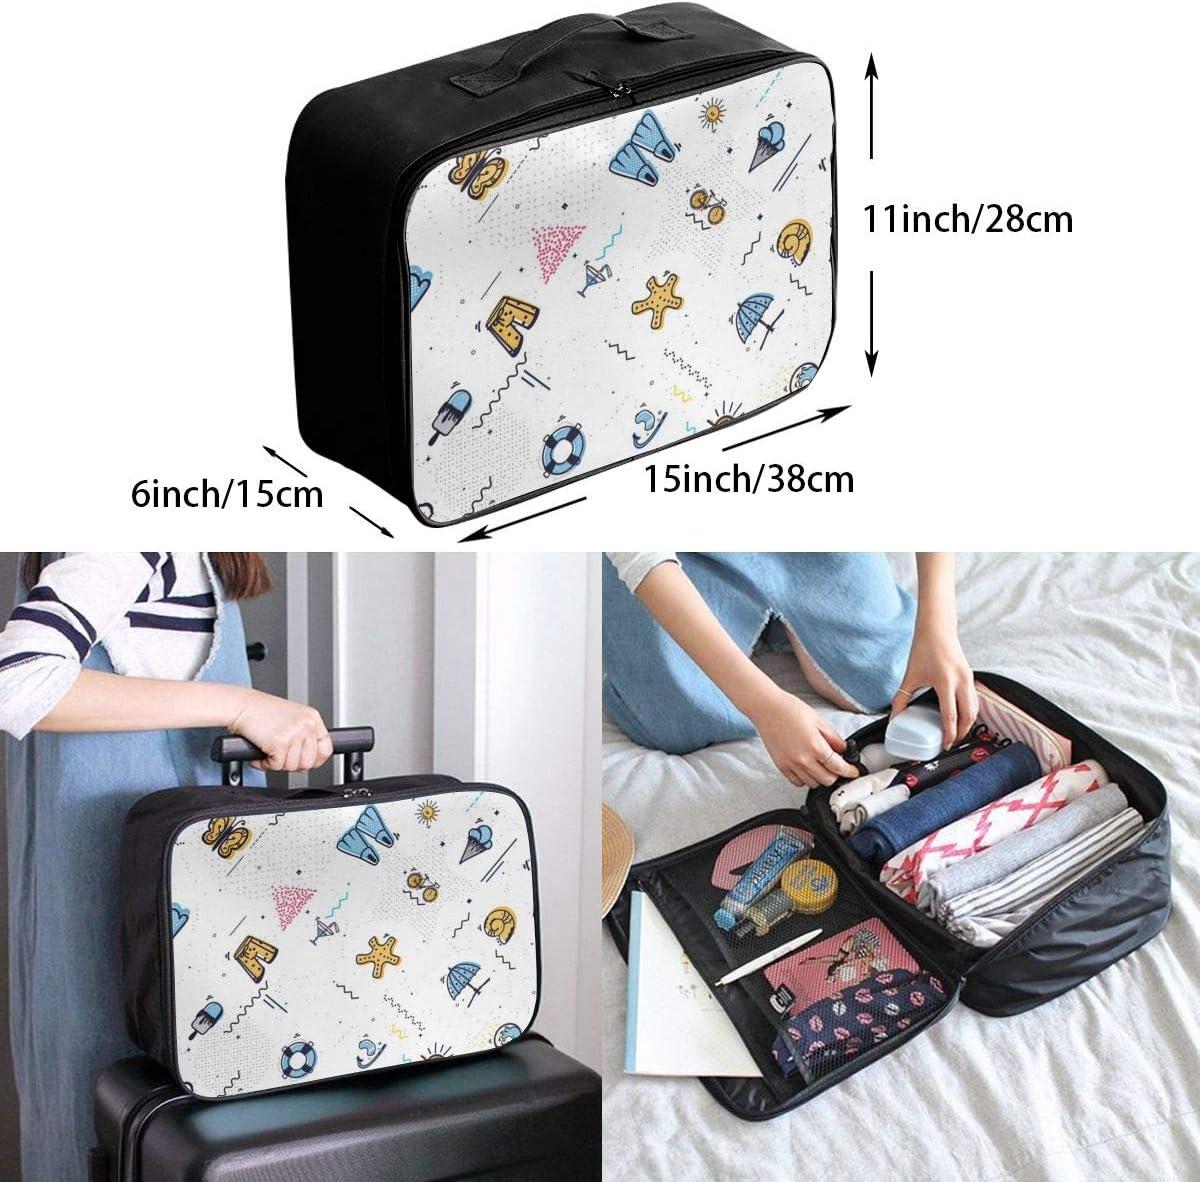 Yunshm Style Summer Customized Trolley Handbag Waterproof Unisex Large Capacity For Business Travel Storage